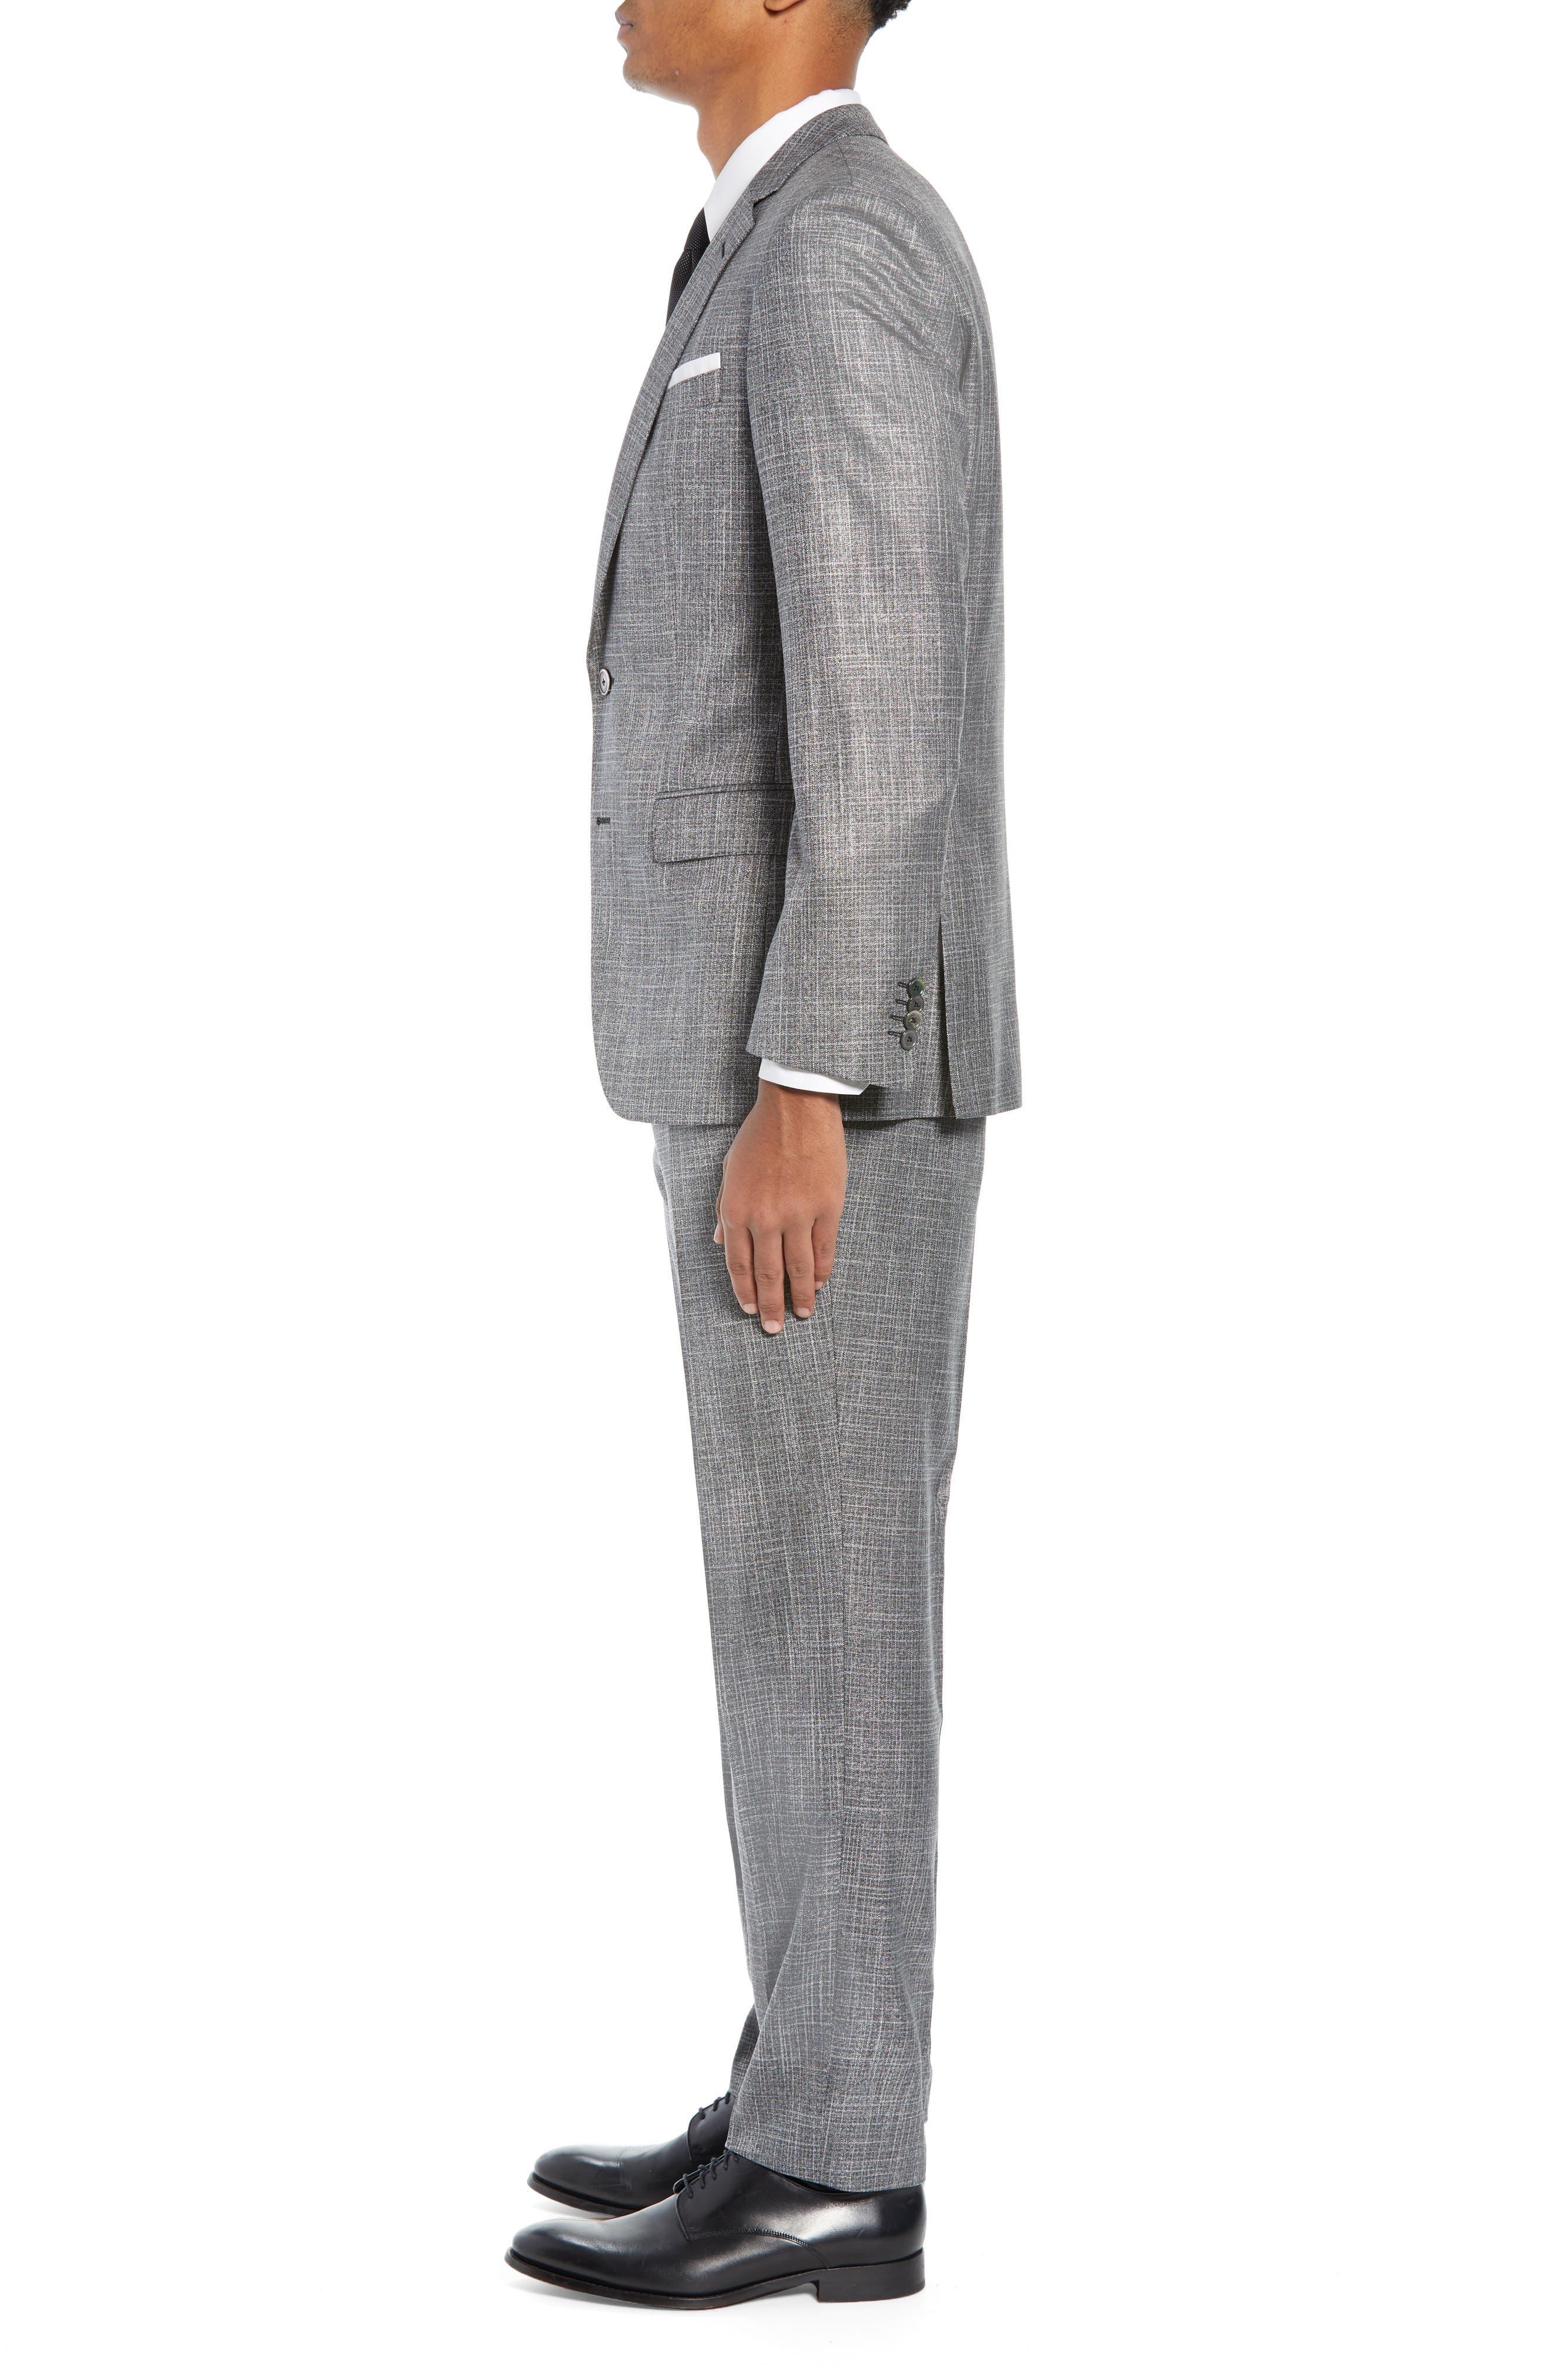 Hutson/Gander Trim Fit Solid Wool Blend Suit,                             Alternate thumbnail 3, color,                             MEDIUM GREY